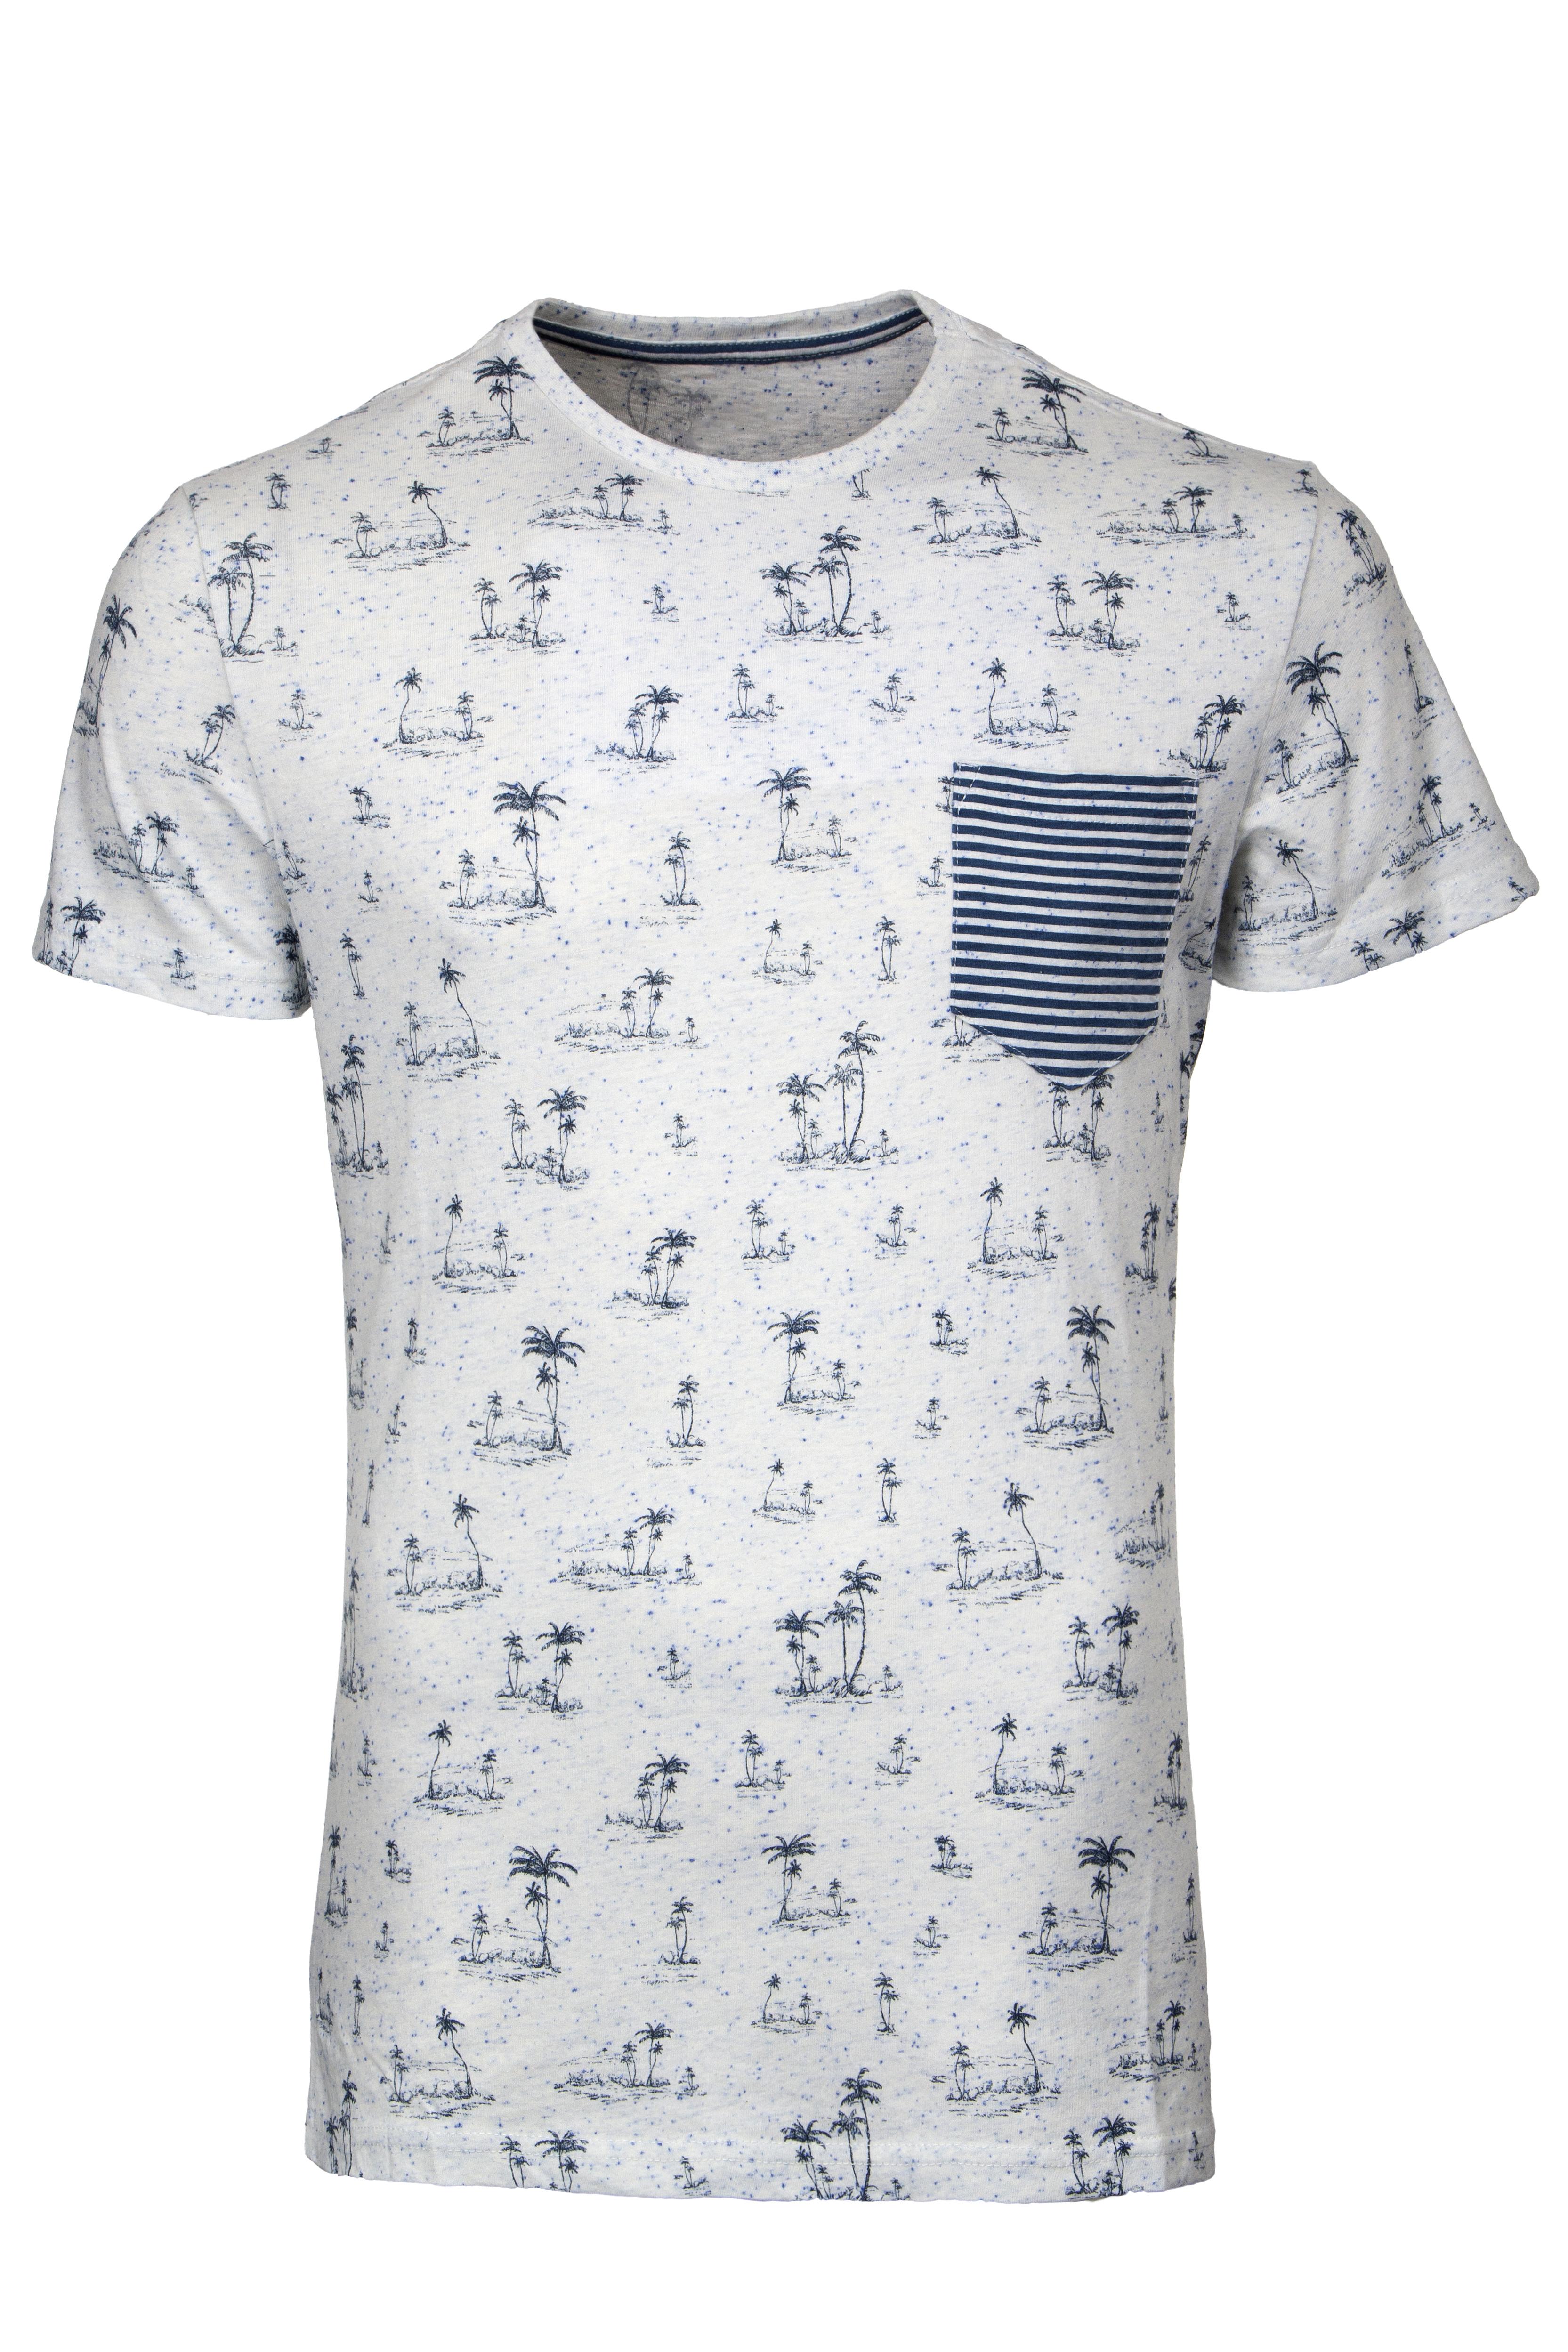 Bespoke printed T-Shirts